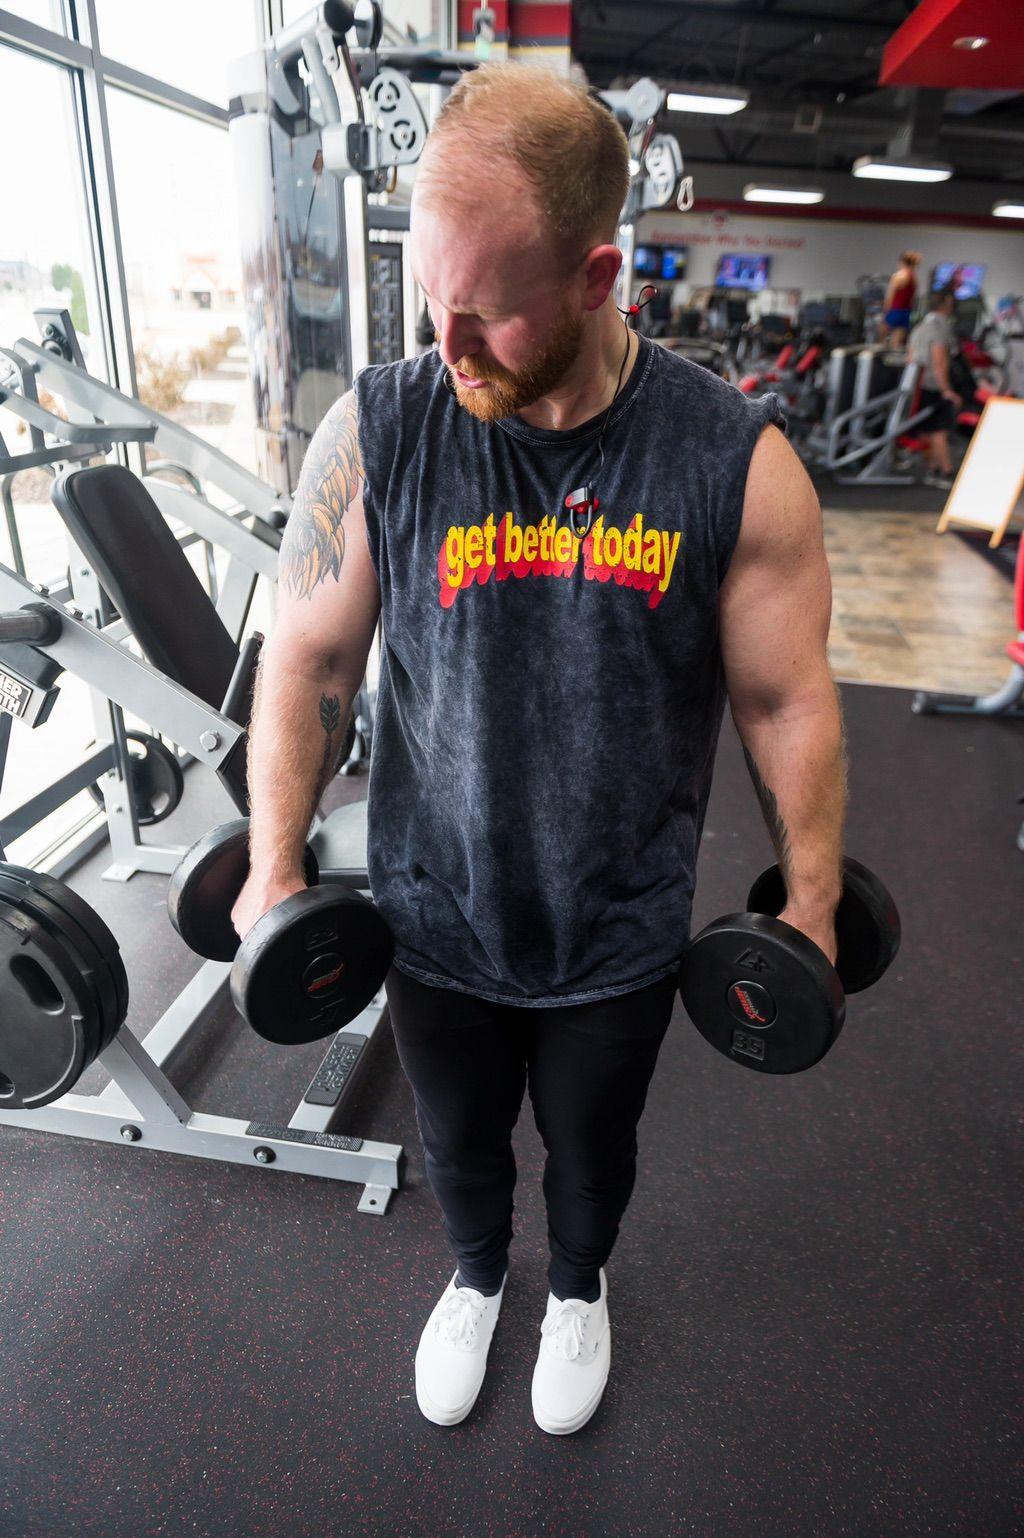 Mike Wollard Training, LLC